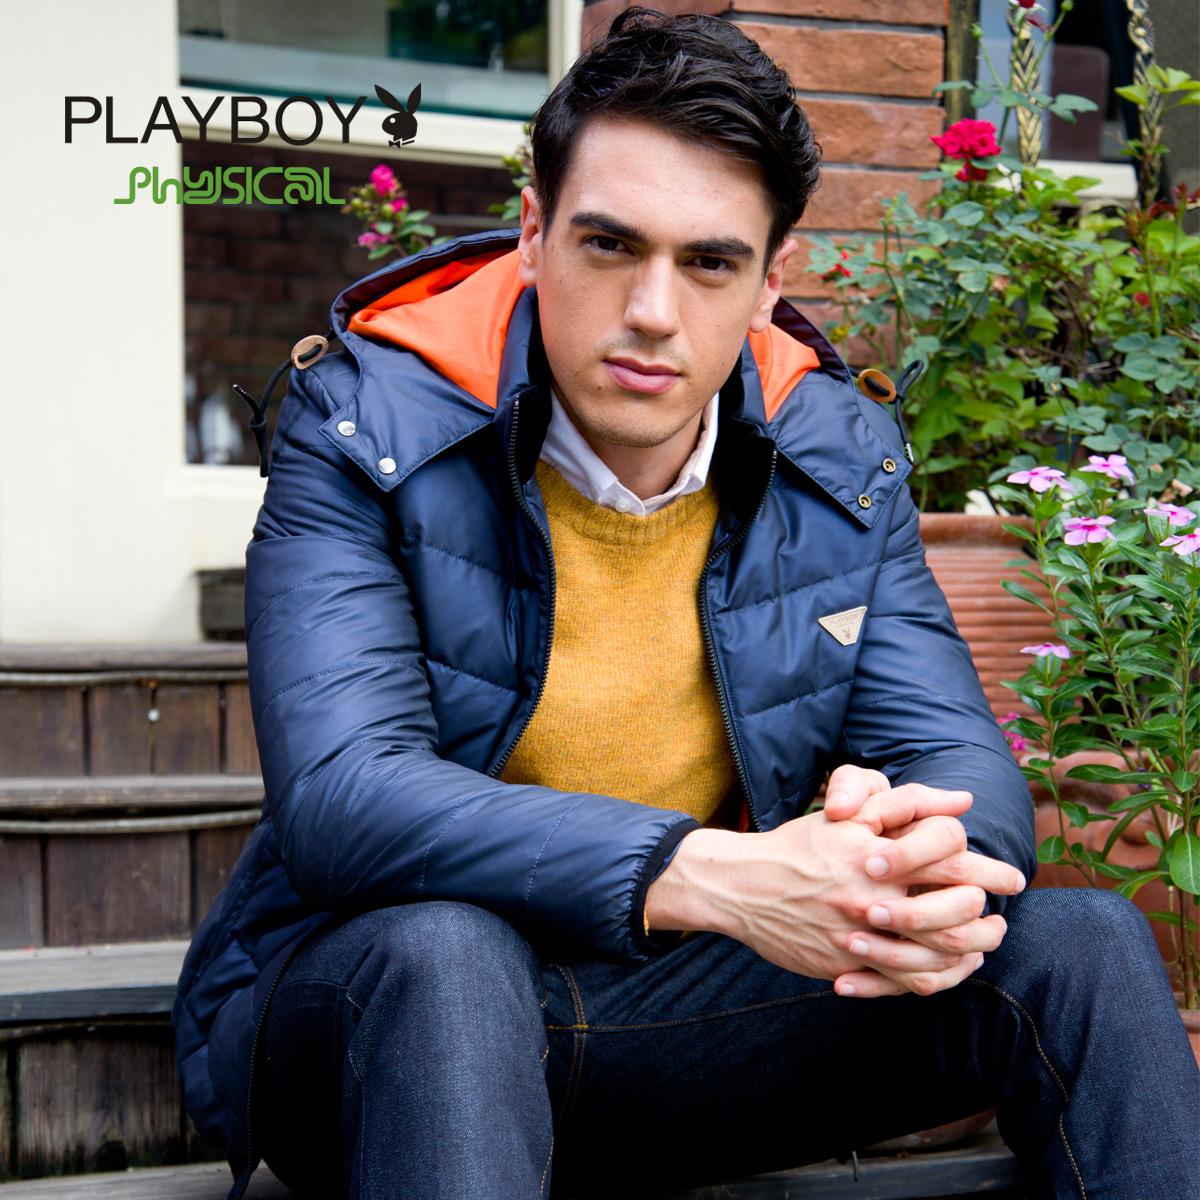 Спортивный пуховик Playboy 2014